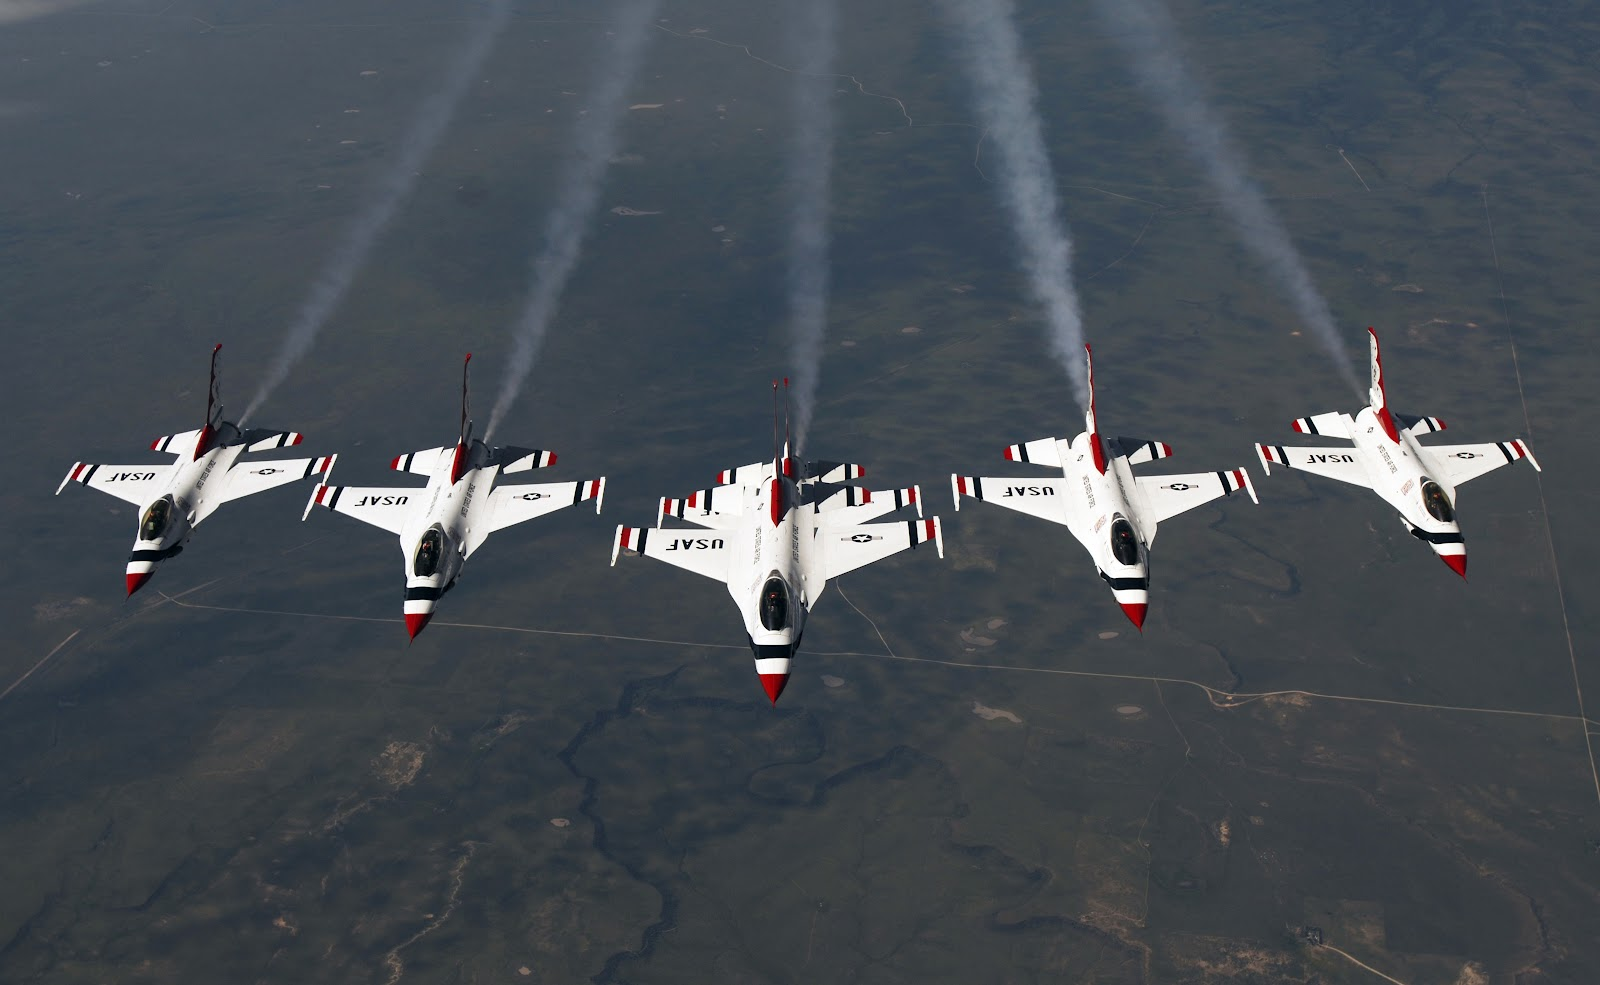 http://4.bp.blogspot.com/-RMEfsGoB3ig/T6E8W5ziCiI/AAAAAAAAIBw/chkT5AekM_I/s1600/f16_falcon_thunderbird_formation.jpg